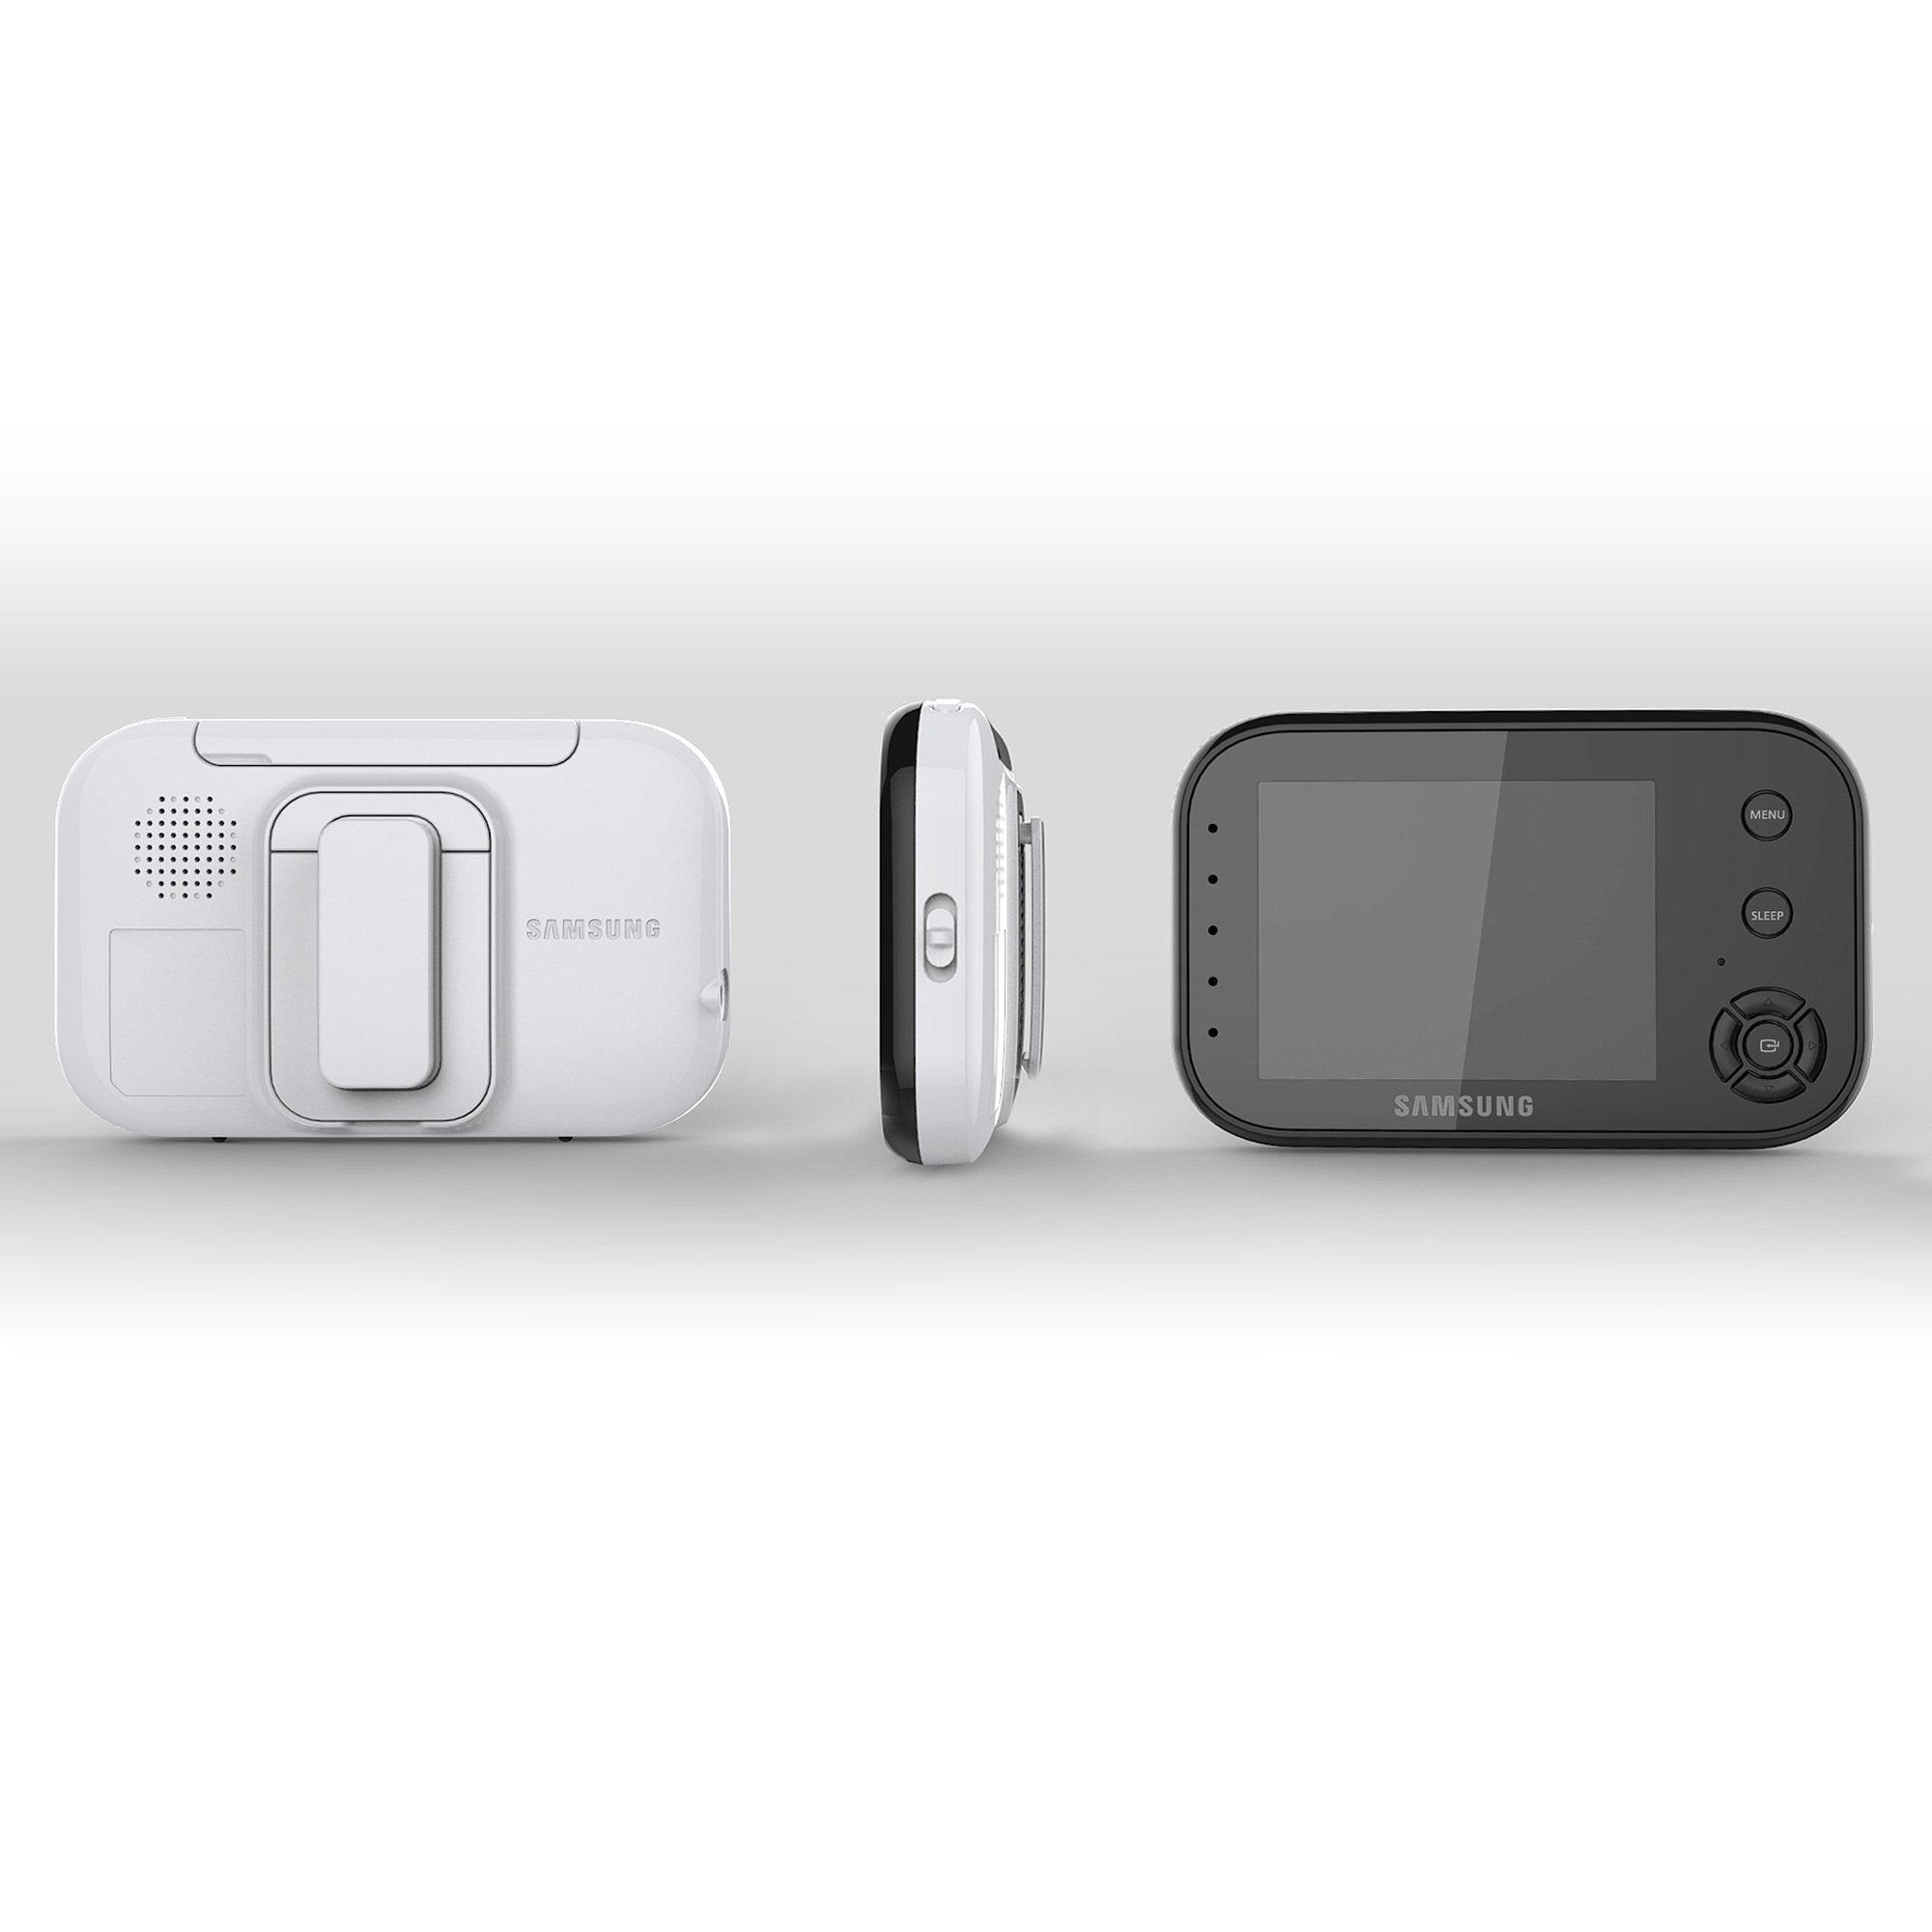 Samsung Babyphone SEW-3036W, 250 m